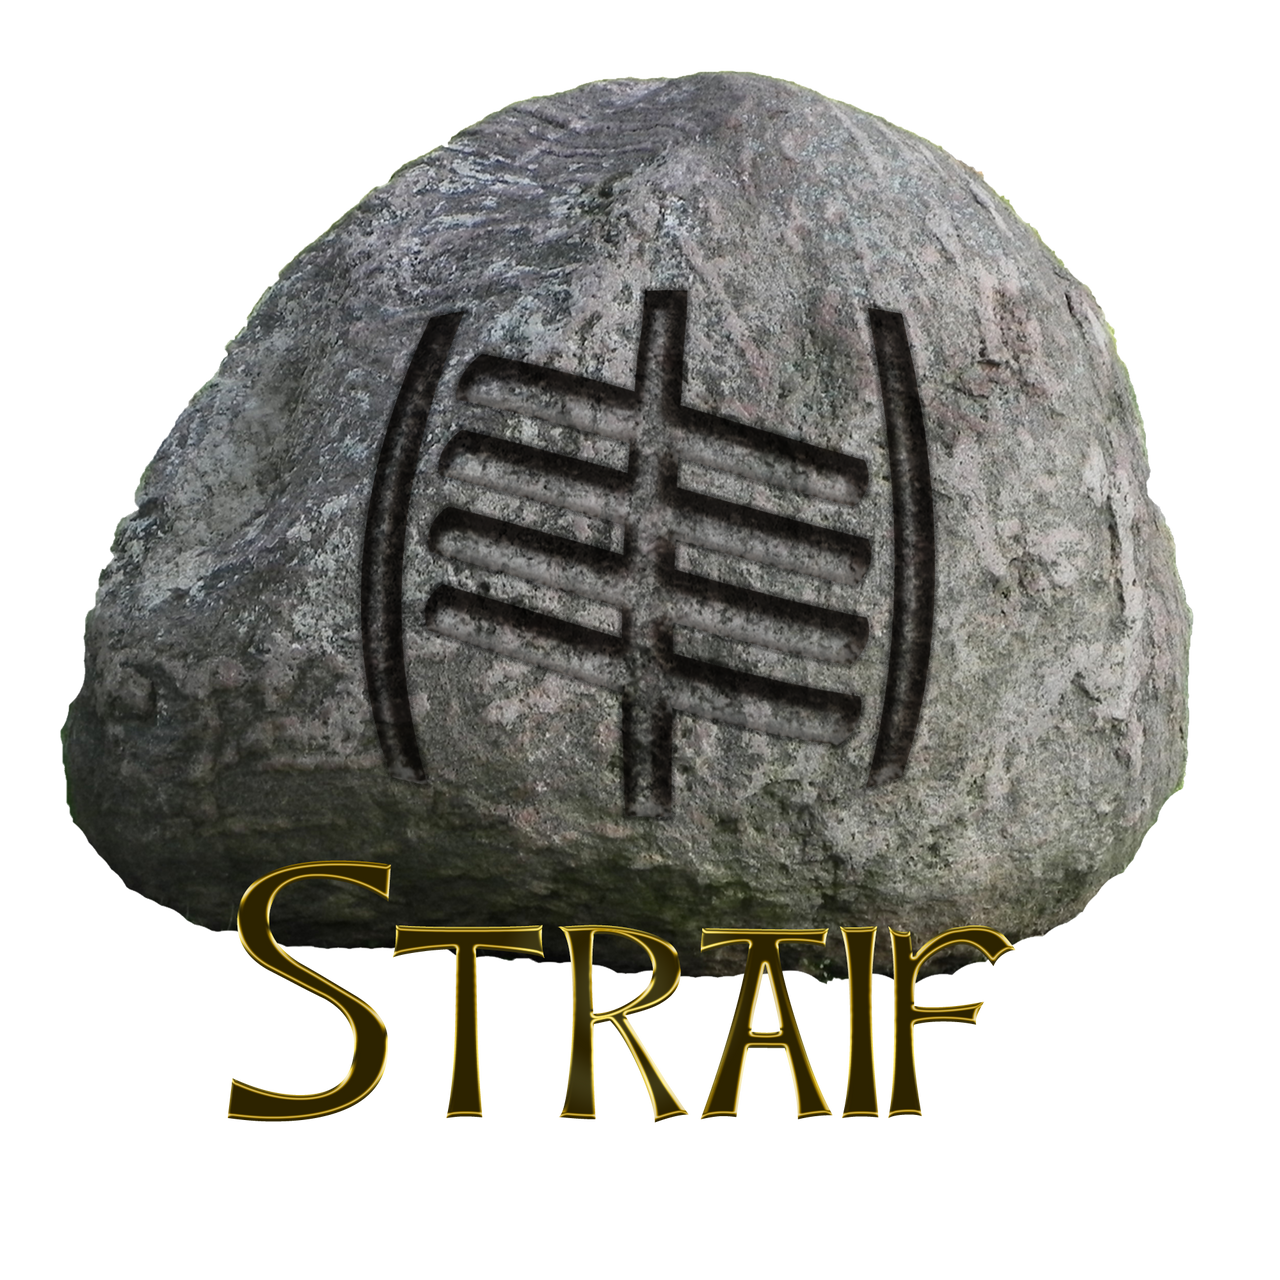 Straif-2018 by knottyprof